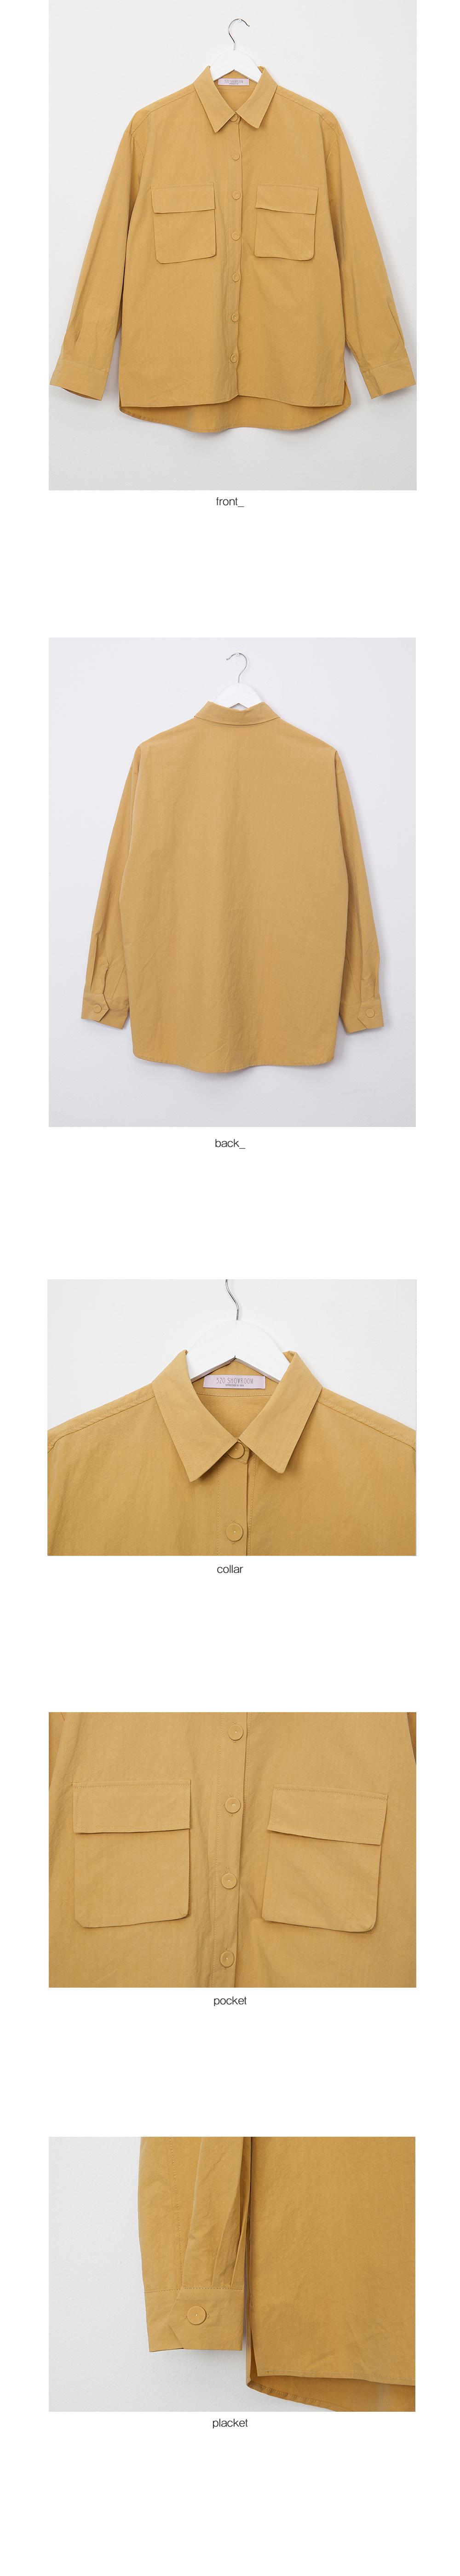 pocket-washing-mustard_03.jpg